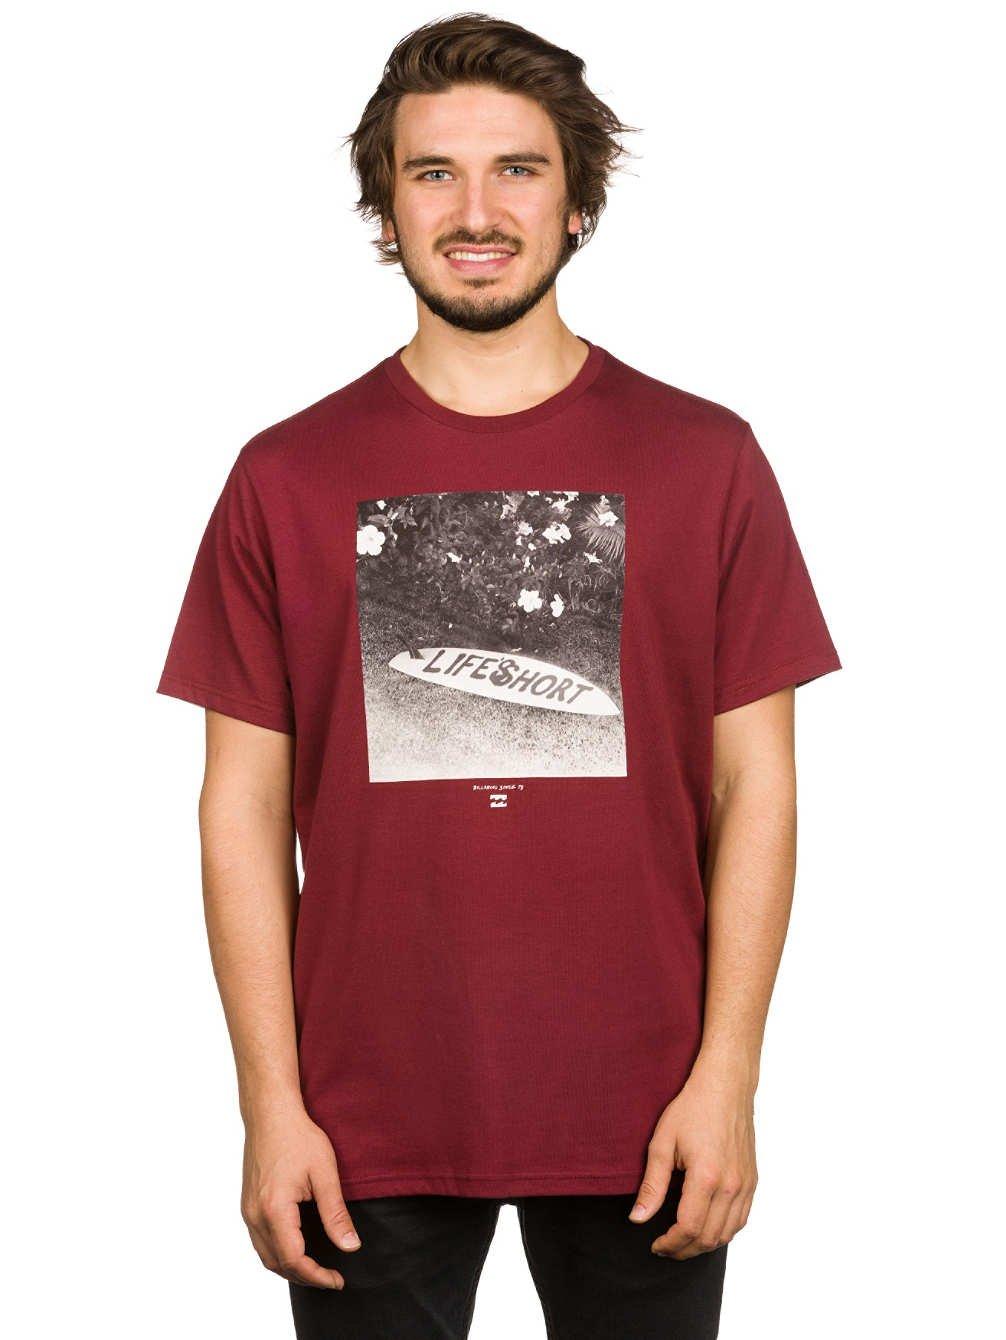 Billabong Men's Short Sleeve LIFES SHORT T-Shirt, Men, LIFES SHORT Short Sleeve TEE